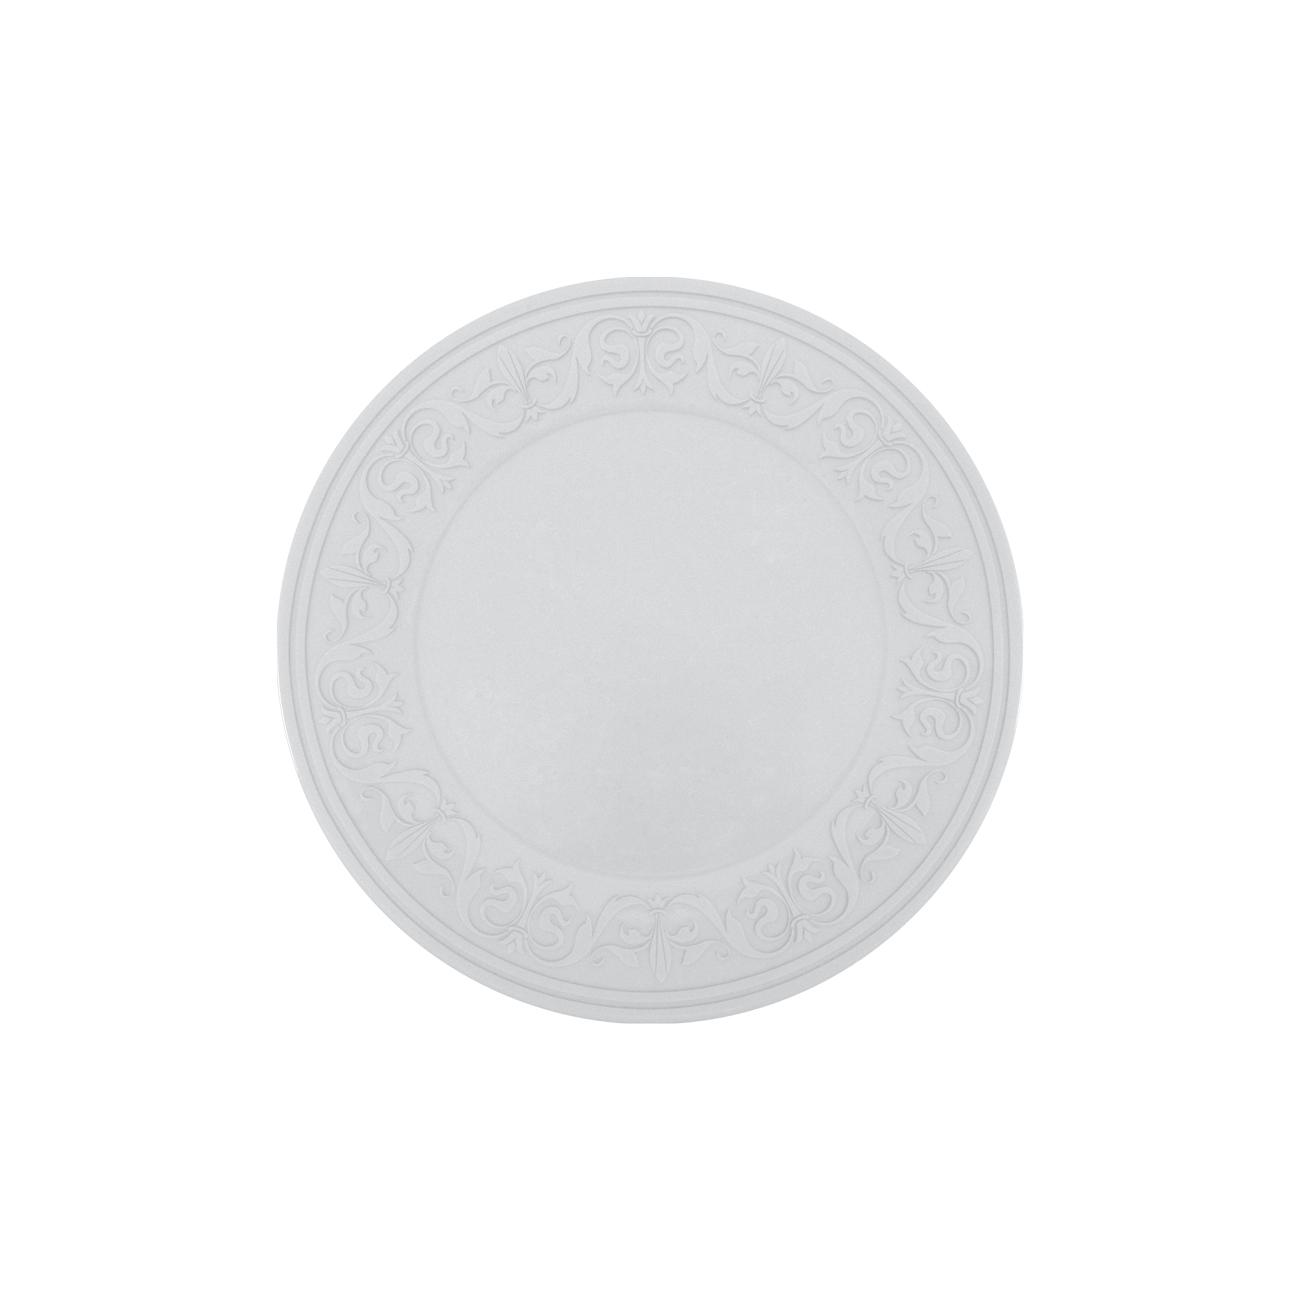 Prato Sobremesa 23cm Pétala Simples 0